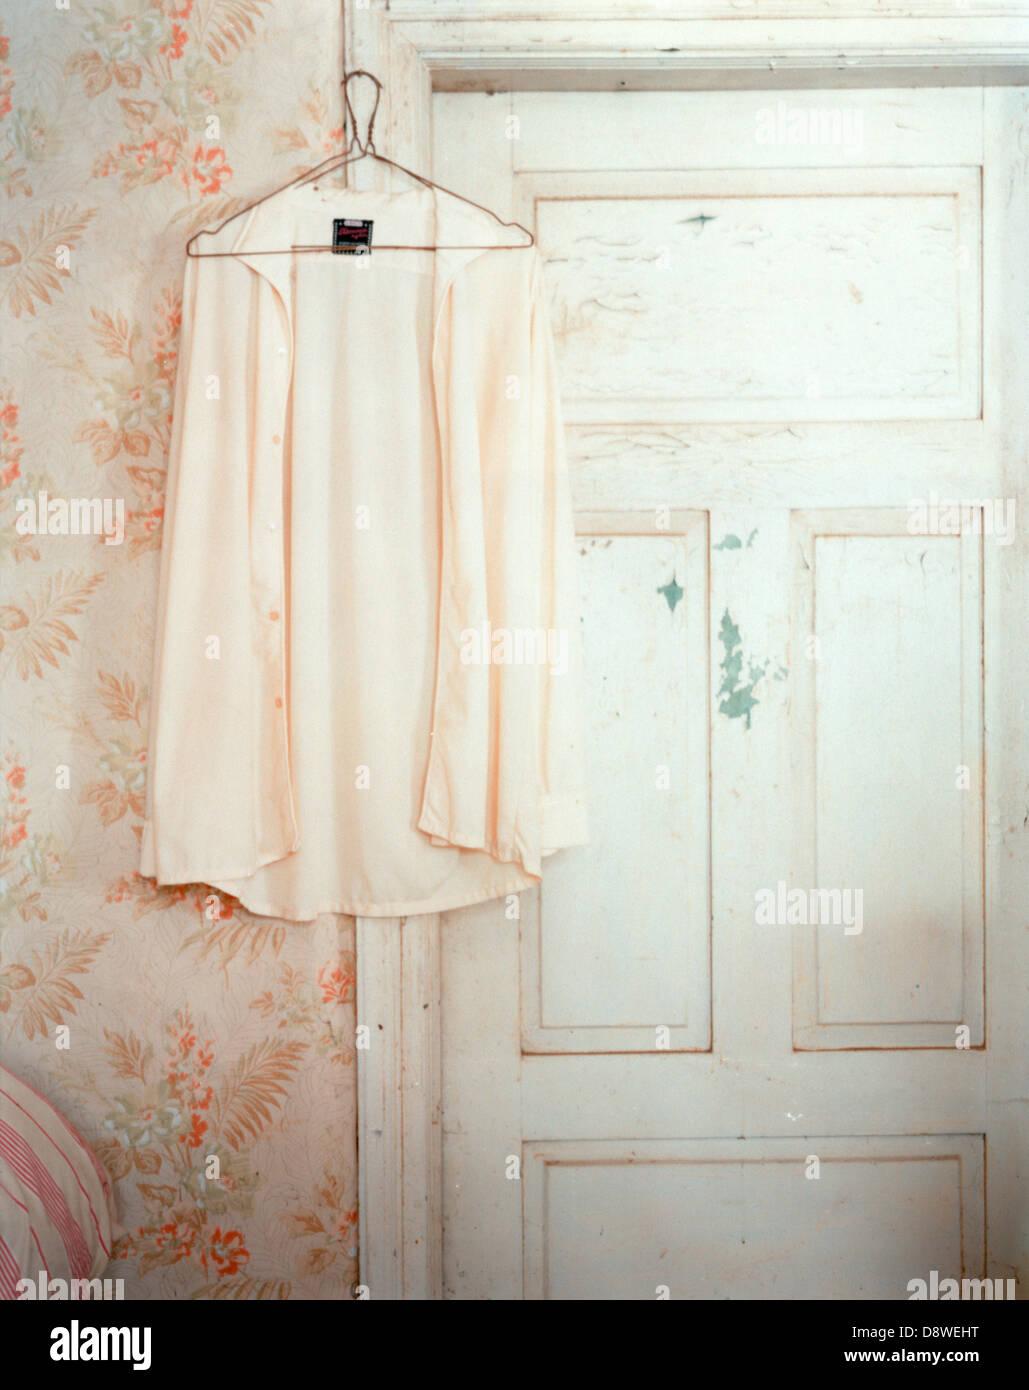 Shirt on hanger hung on doorframe - Stock Image